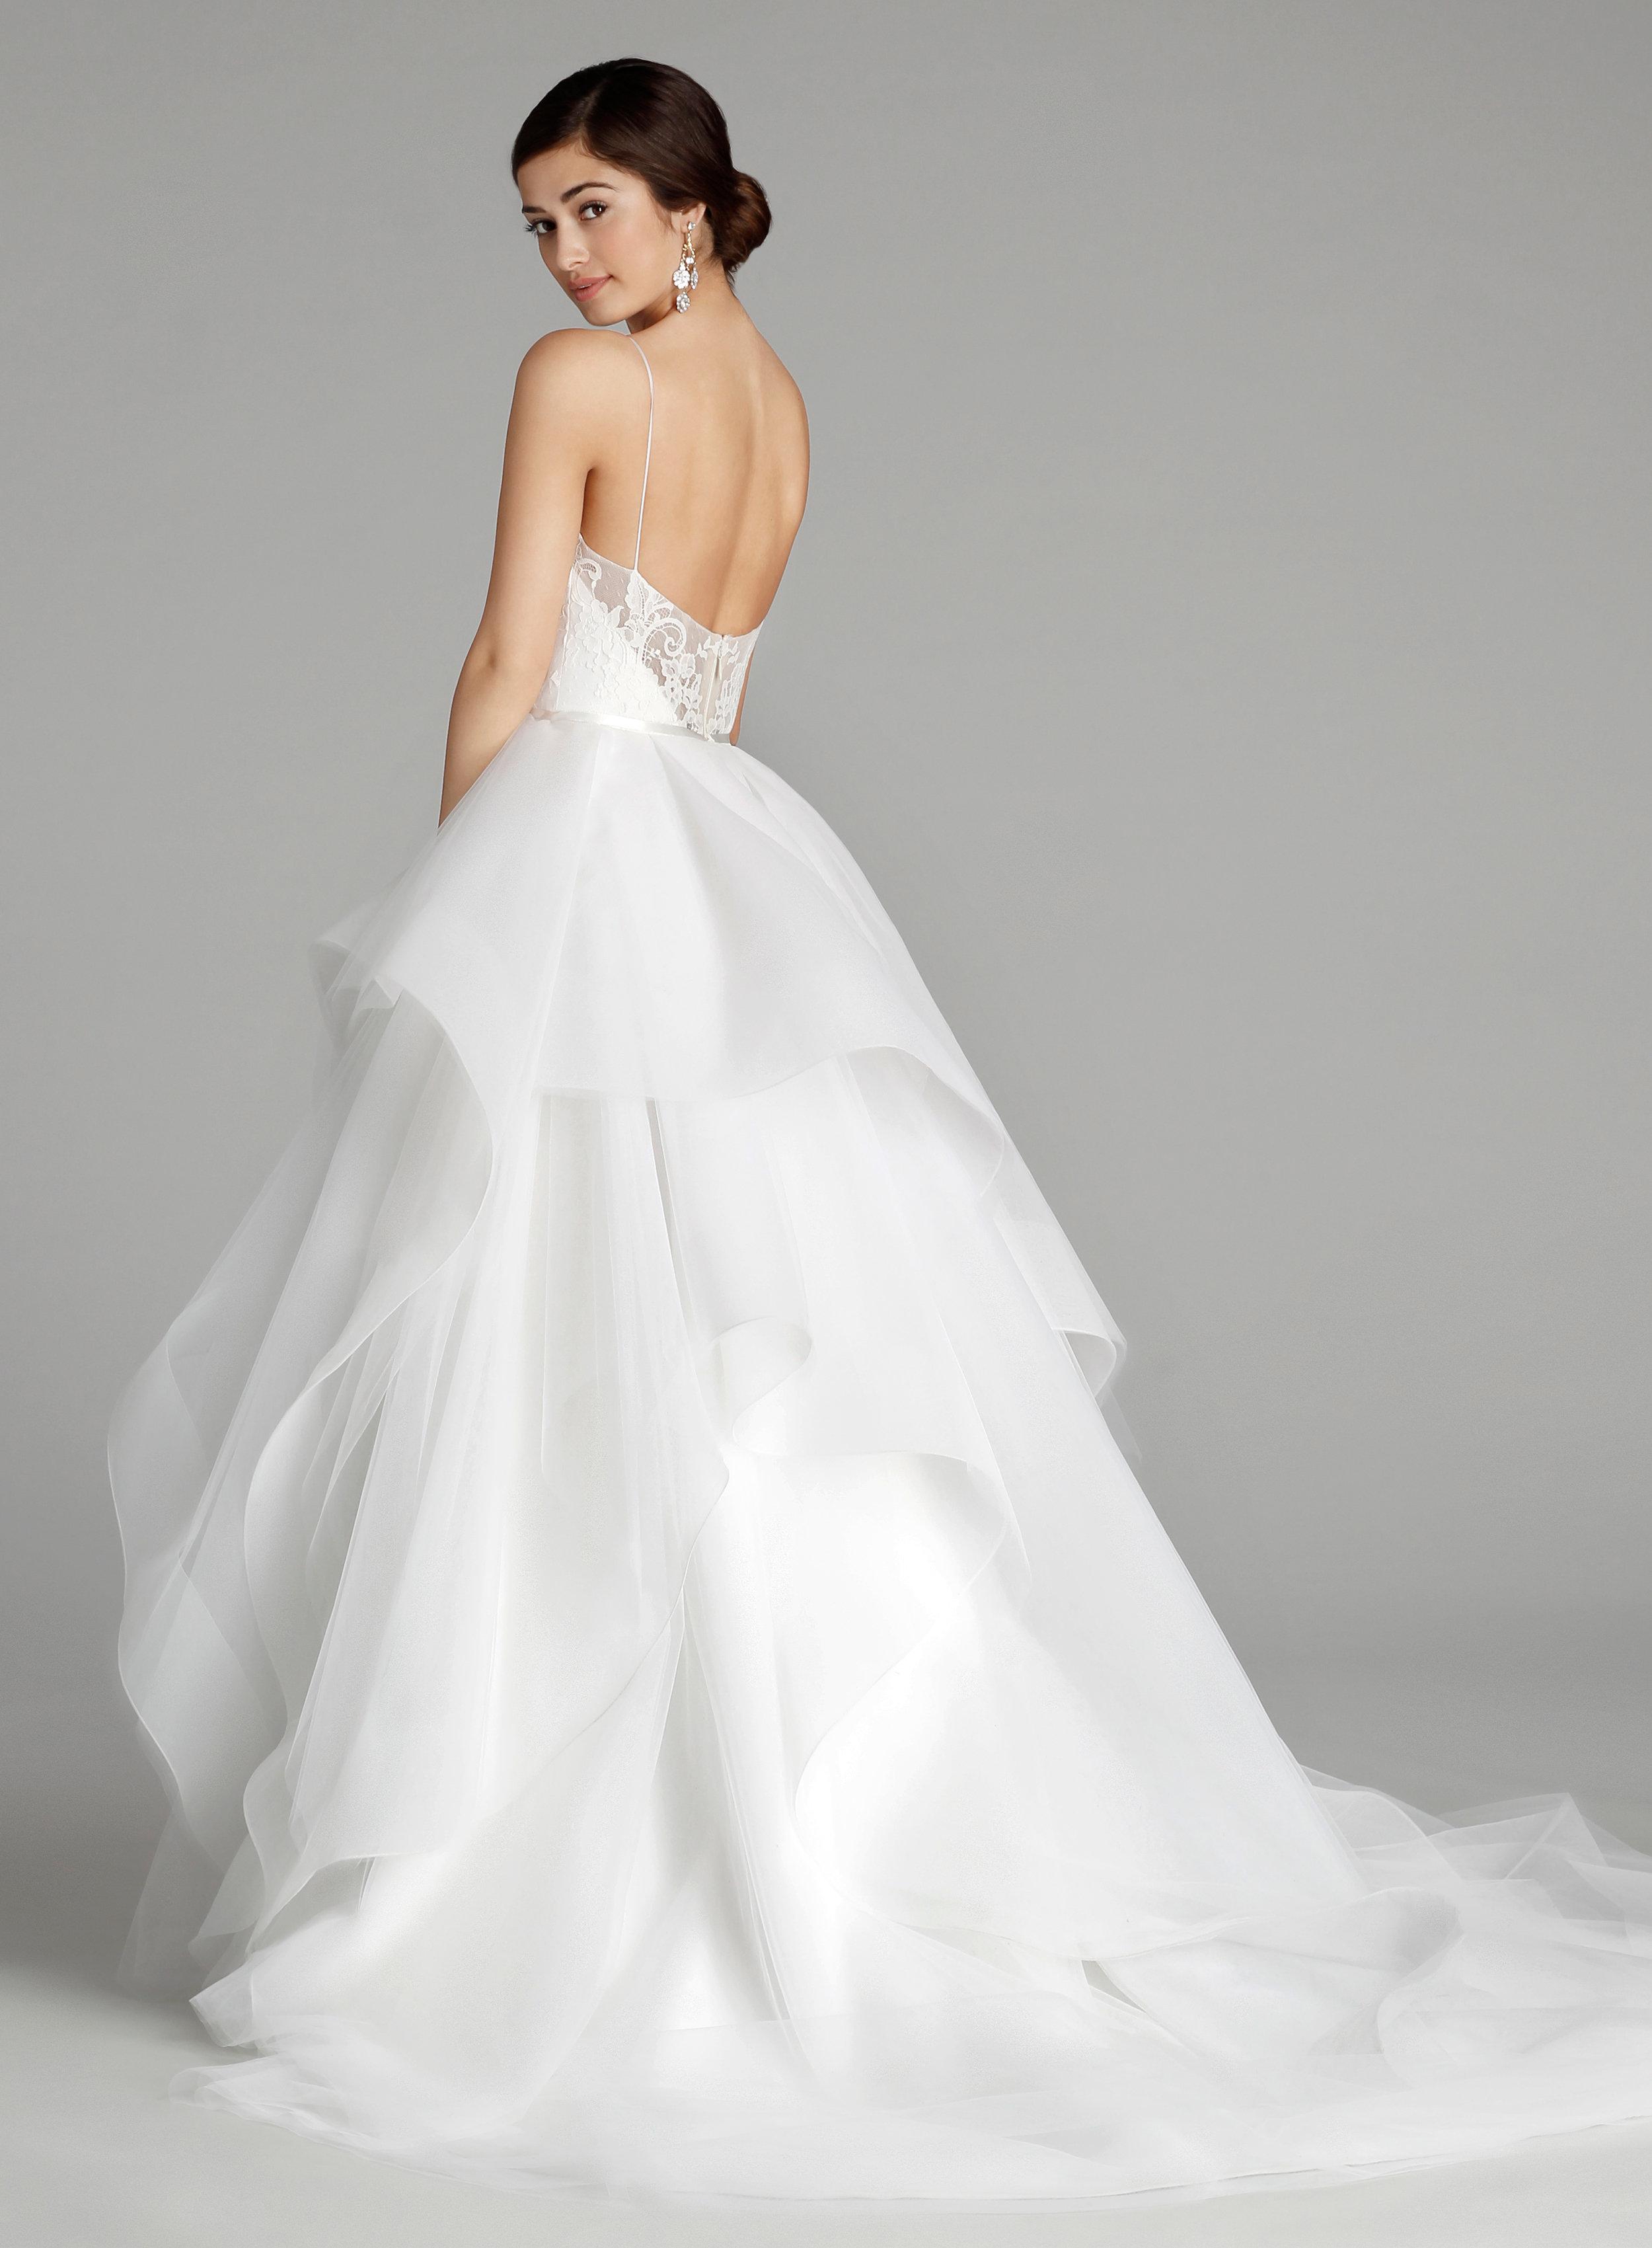 Alvina Valenta Style 9659 Bridal Gown